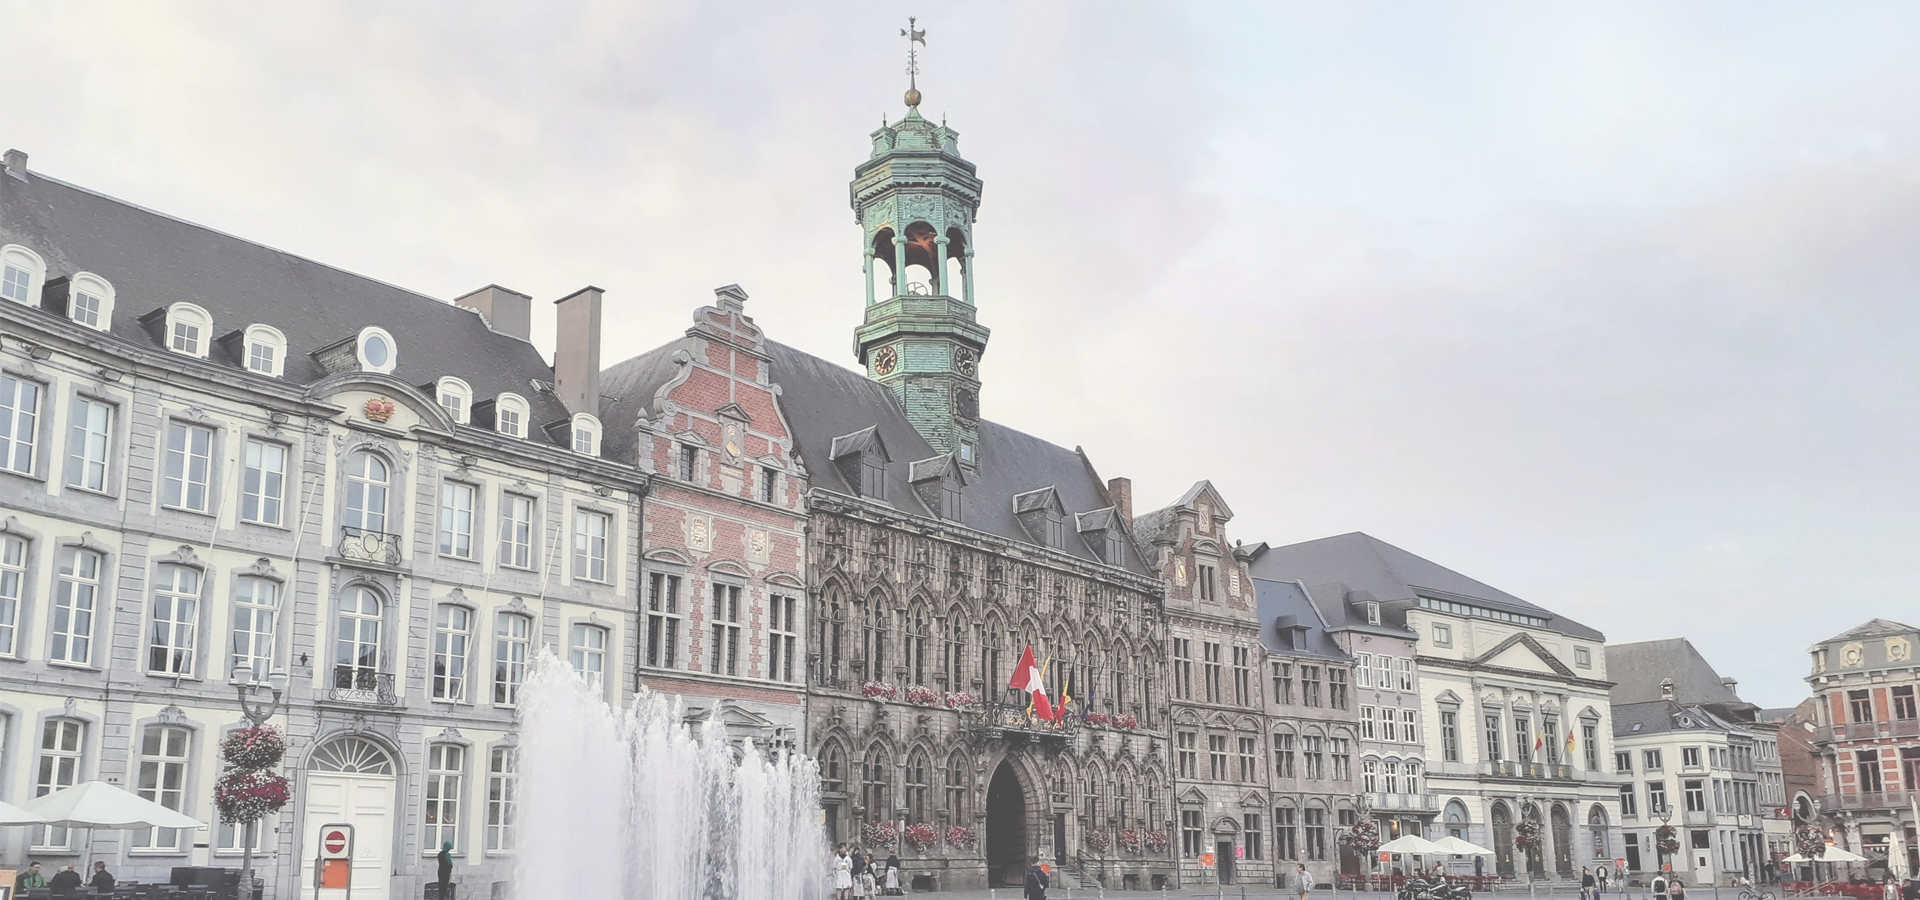 Peer-to-peer advisory in Charleroi, Province of Hainaut, Wallonia, Belgium